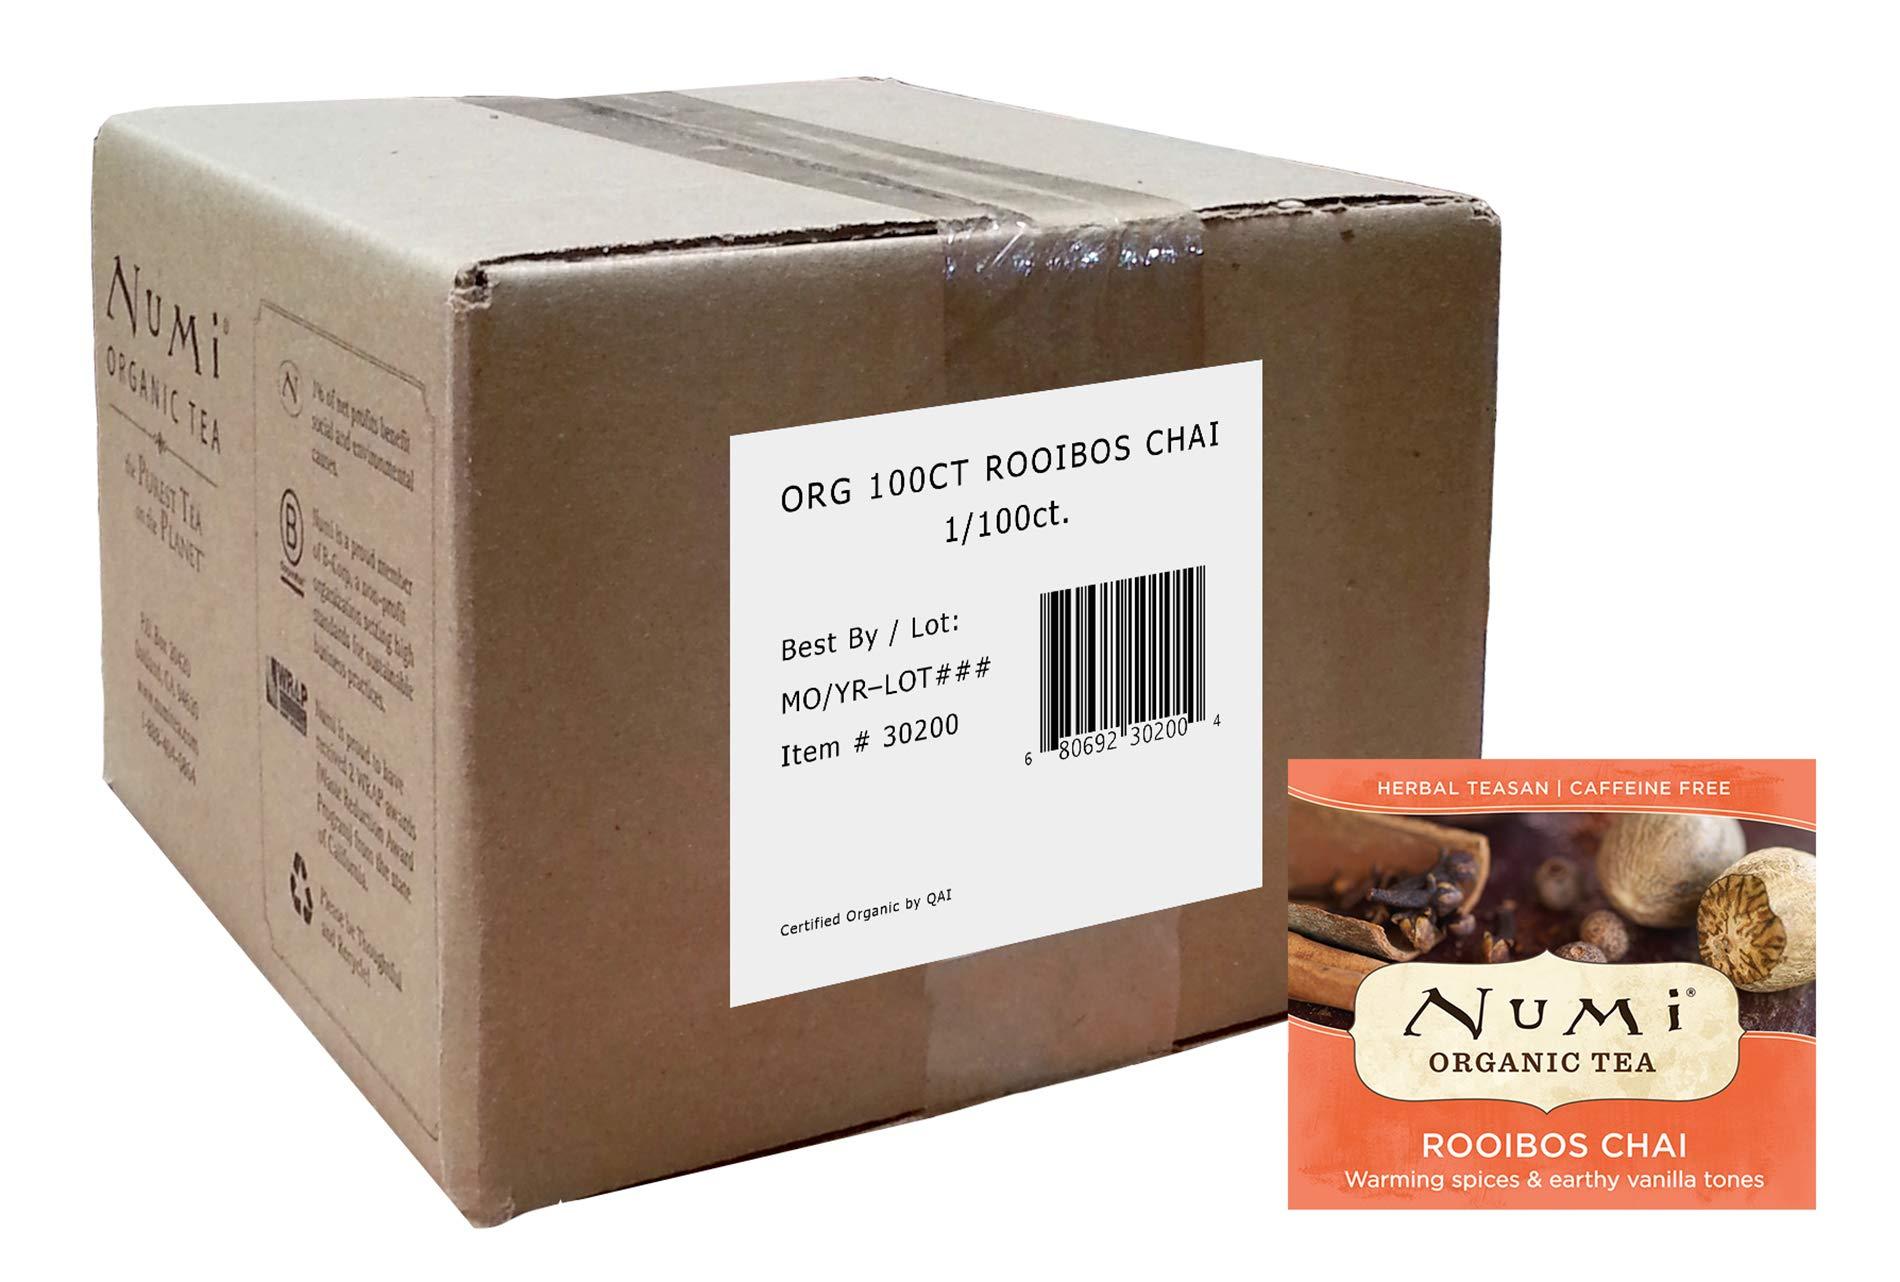 Numi Organic Tea Rooibos Chai, 100 Count Box of Tea Bags, Herbal Teasan, Caffeine-Free (Packaging May Vary)